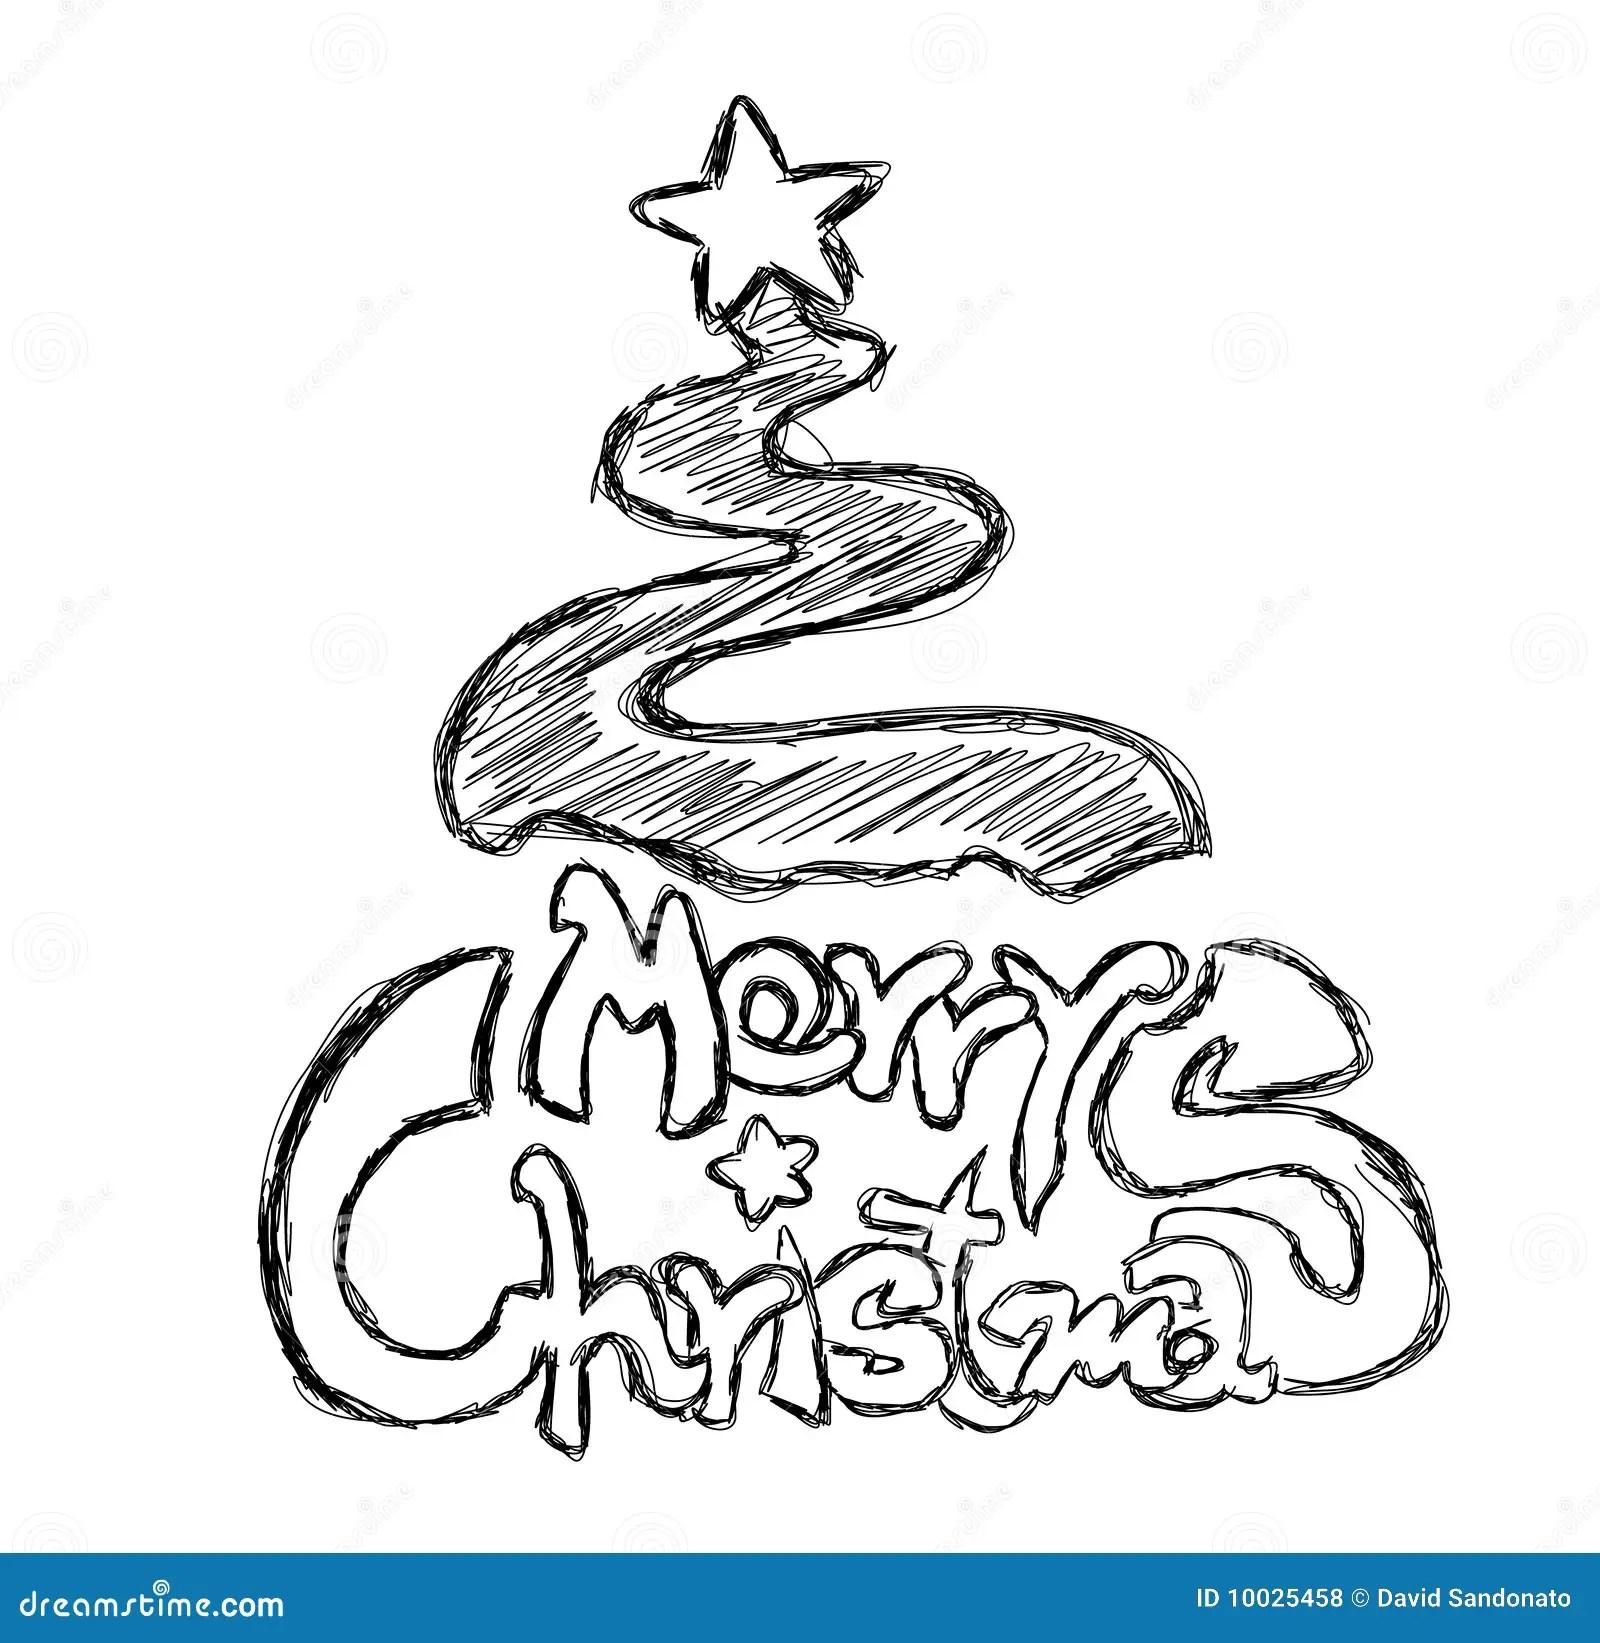 Merry Christmas Phrase Sketch Royalty Free Stock Photos